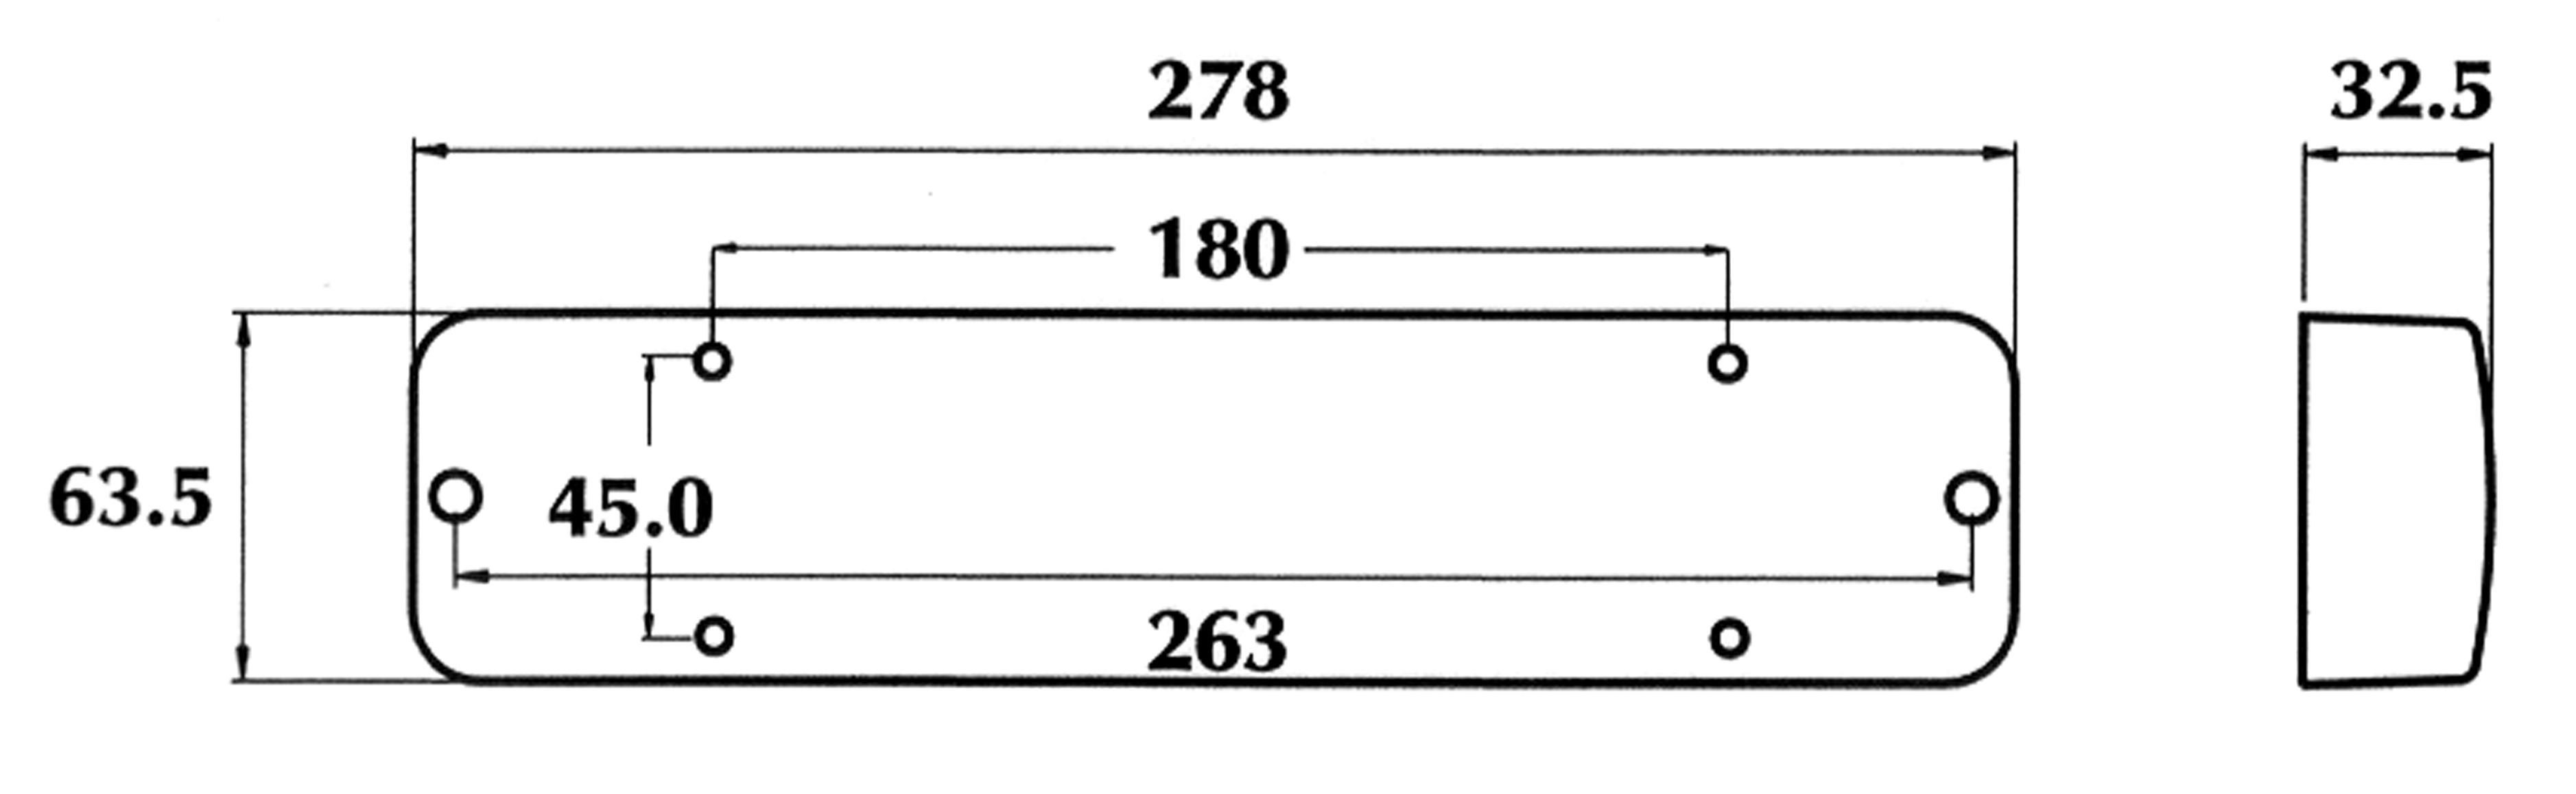 Dasteri - INNENRAUM LEUCHTE 12V ODER 24V